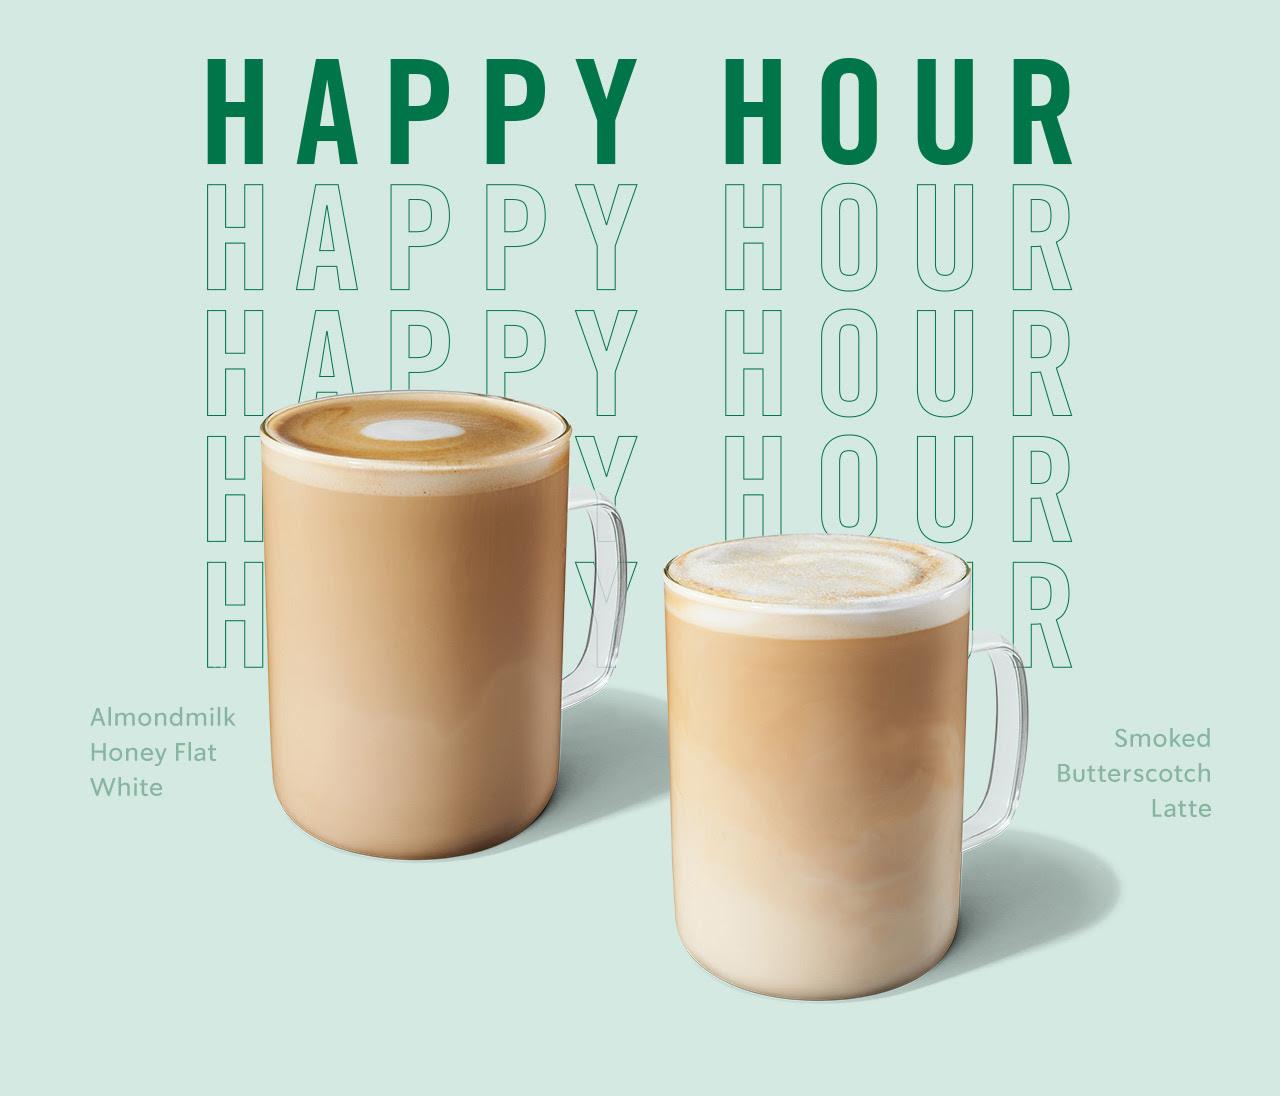 Starbucks Happy Hour Jan 23